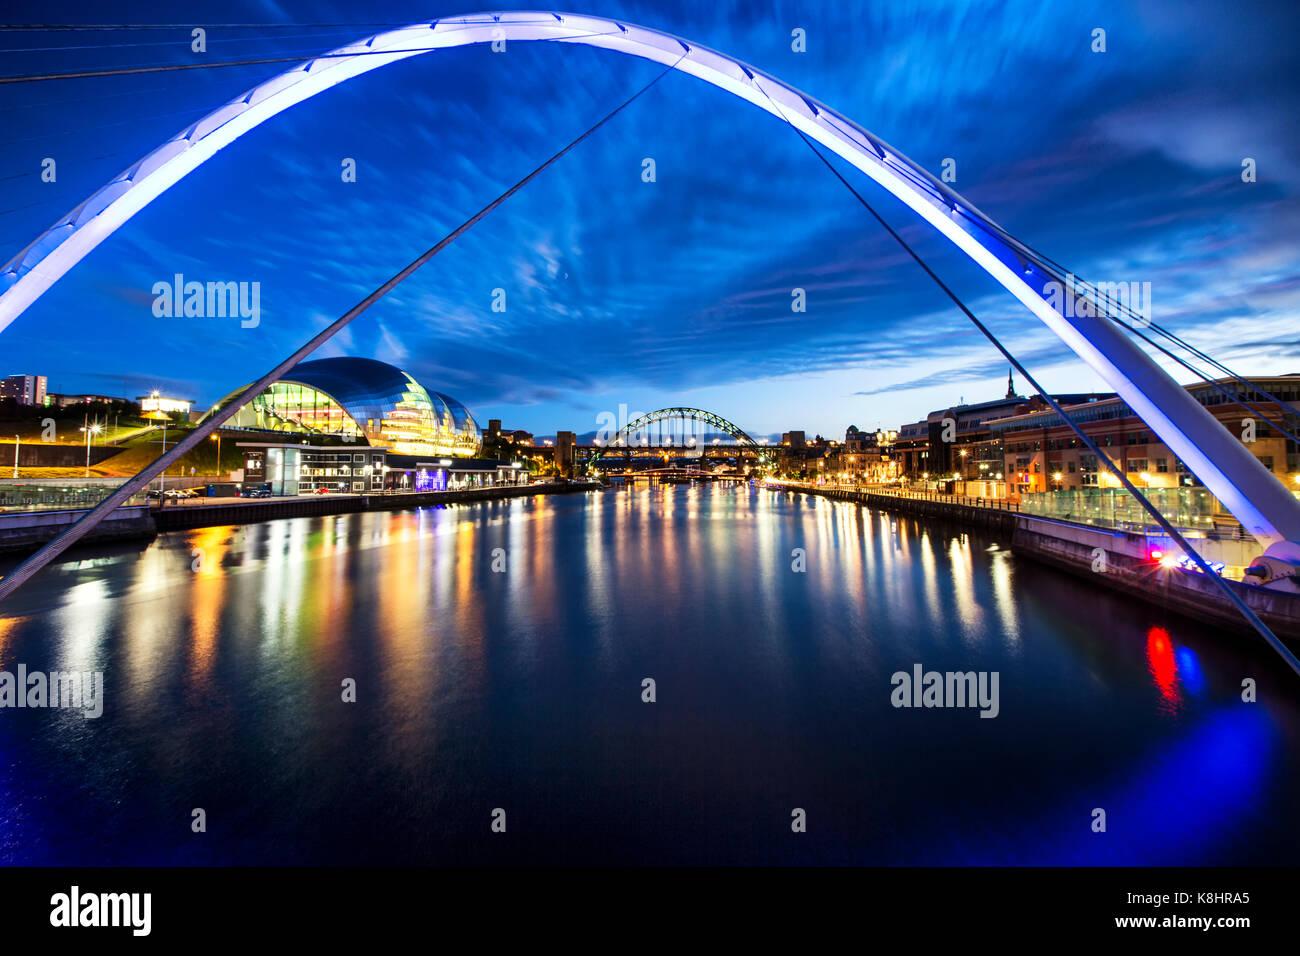 Illuminated Gateshead Millennium Bridge over river against sky Stock Photo